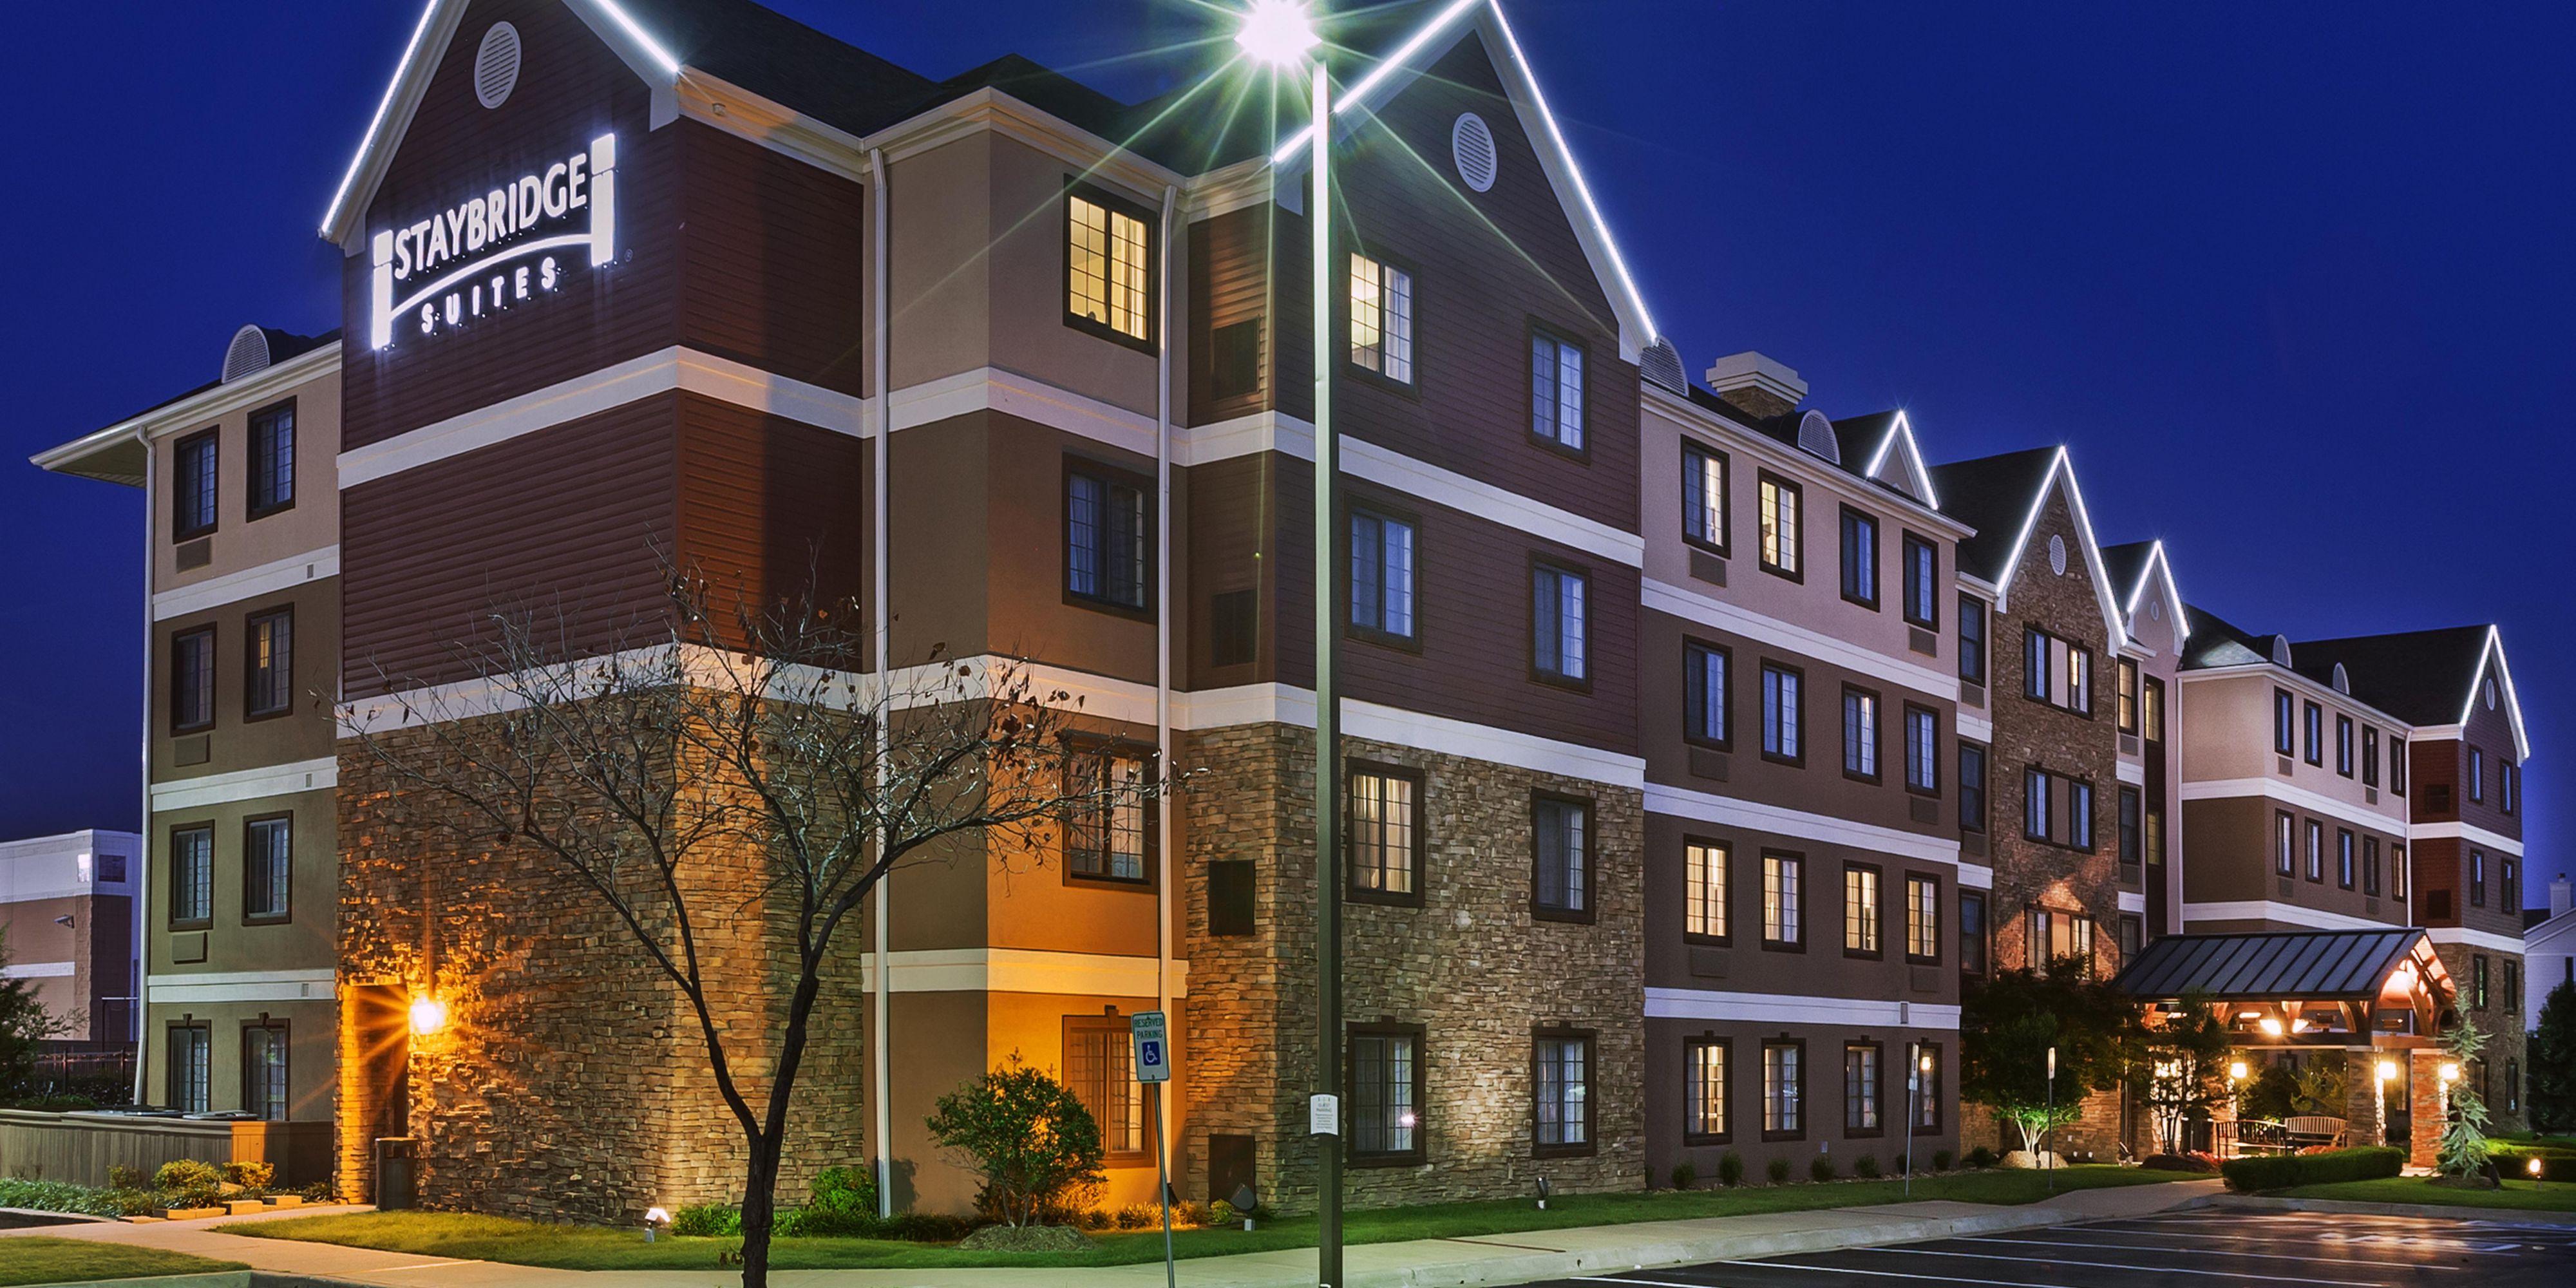 Staybridge Suites Tulsa-Woodland Hills image 0